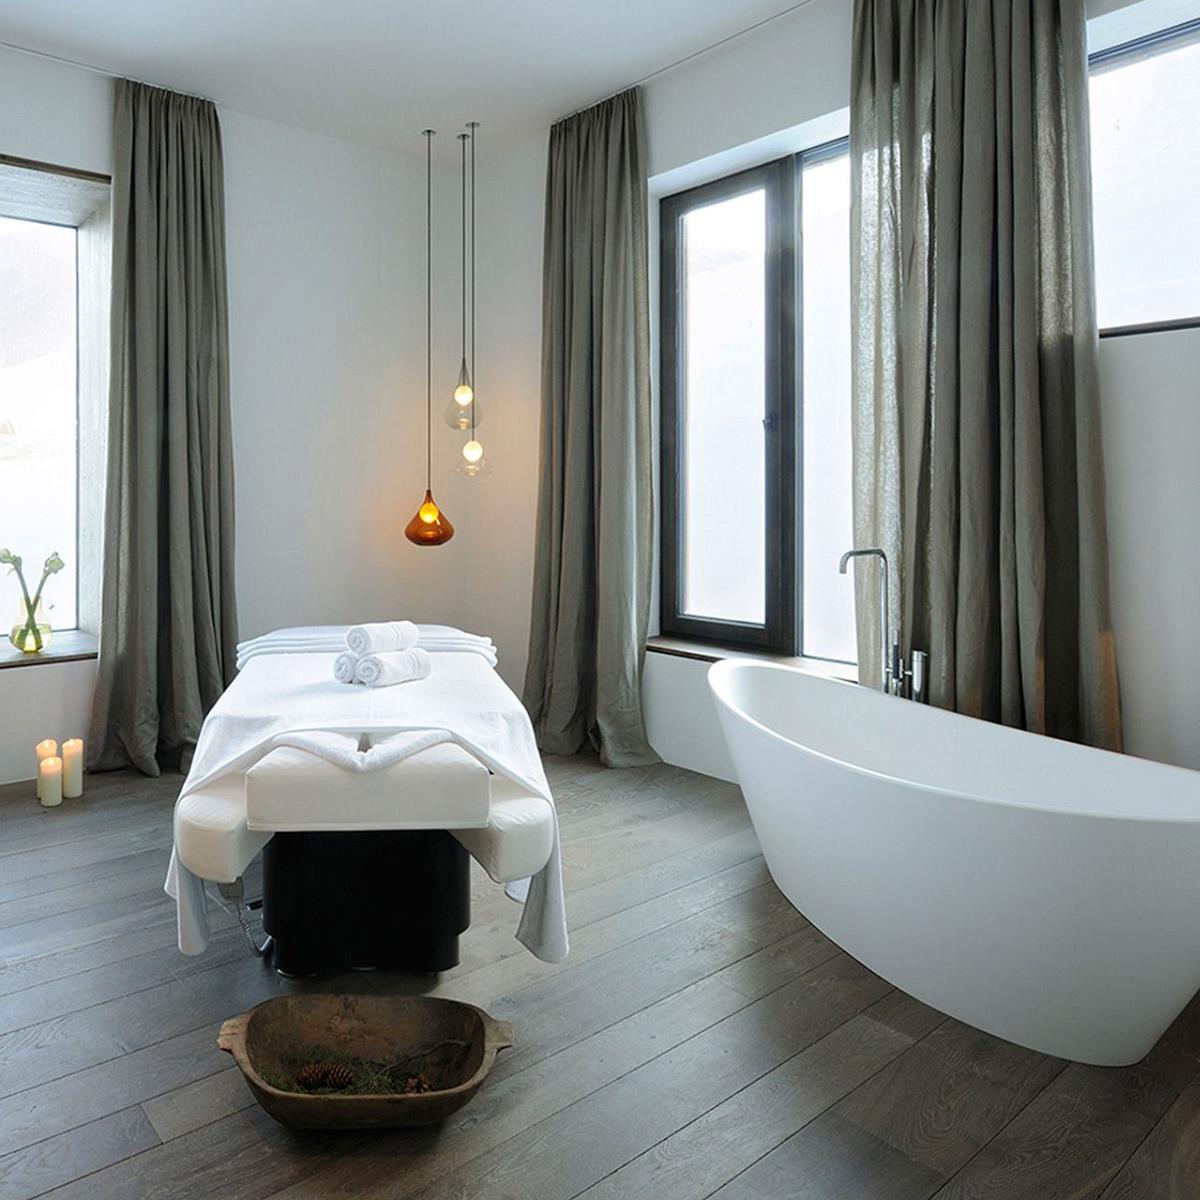 Wiesergut I Member of Design Hotels (1)